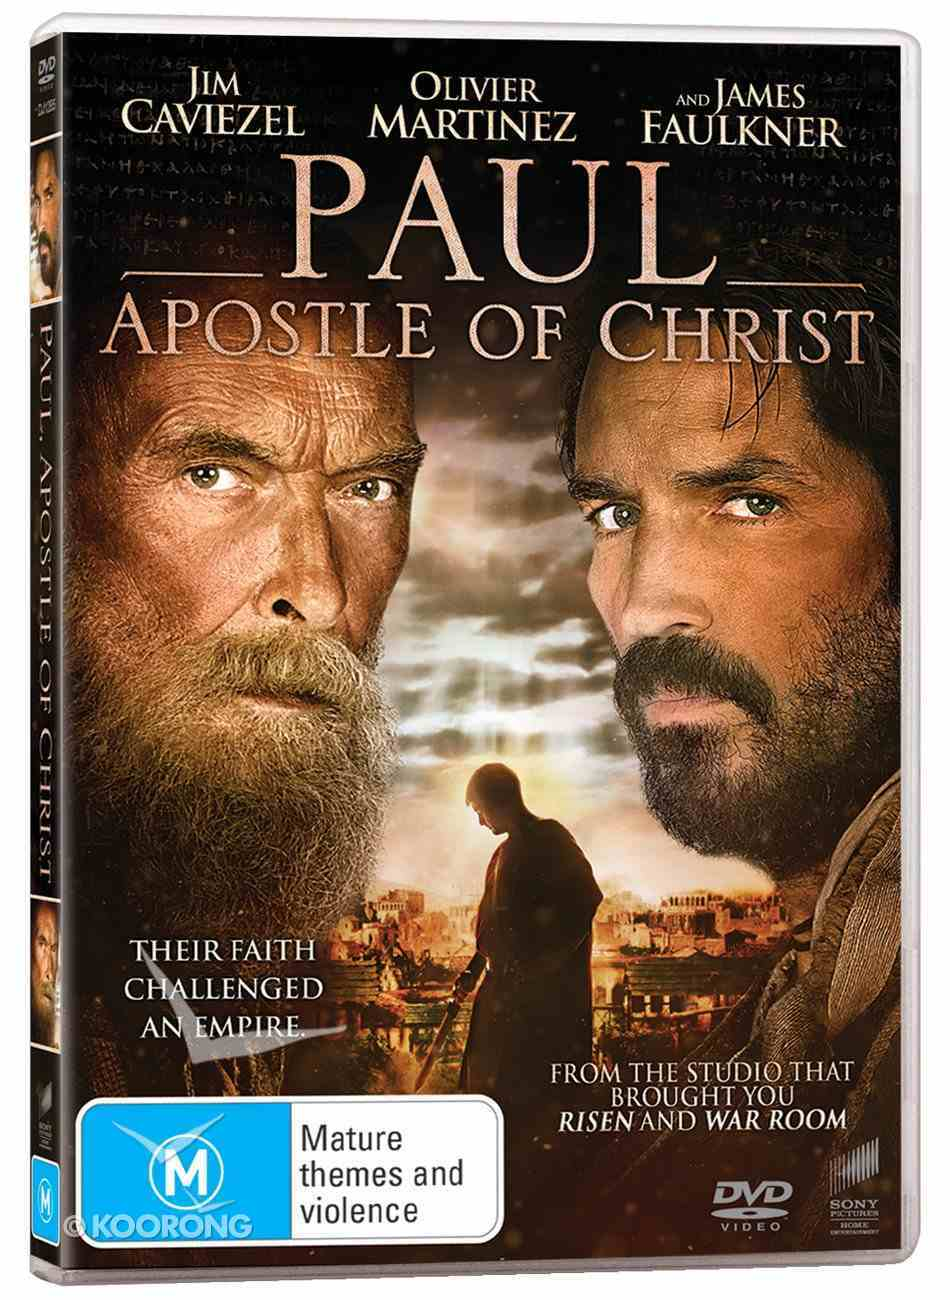 Paul, Apostle of Christ Movie DVD